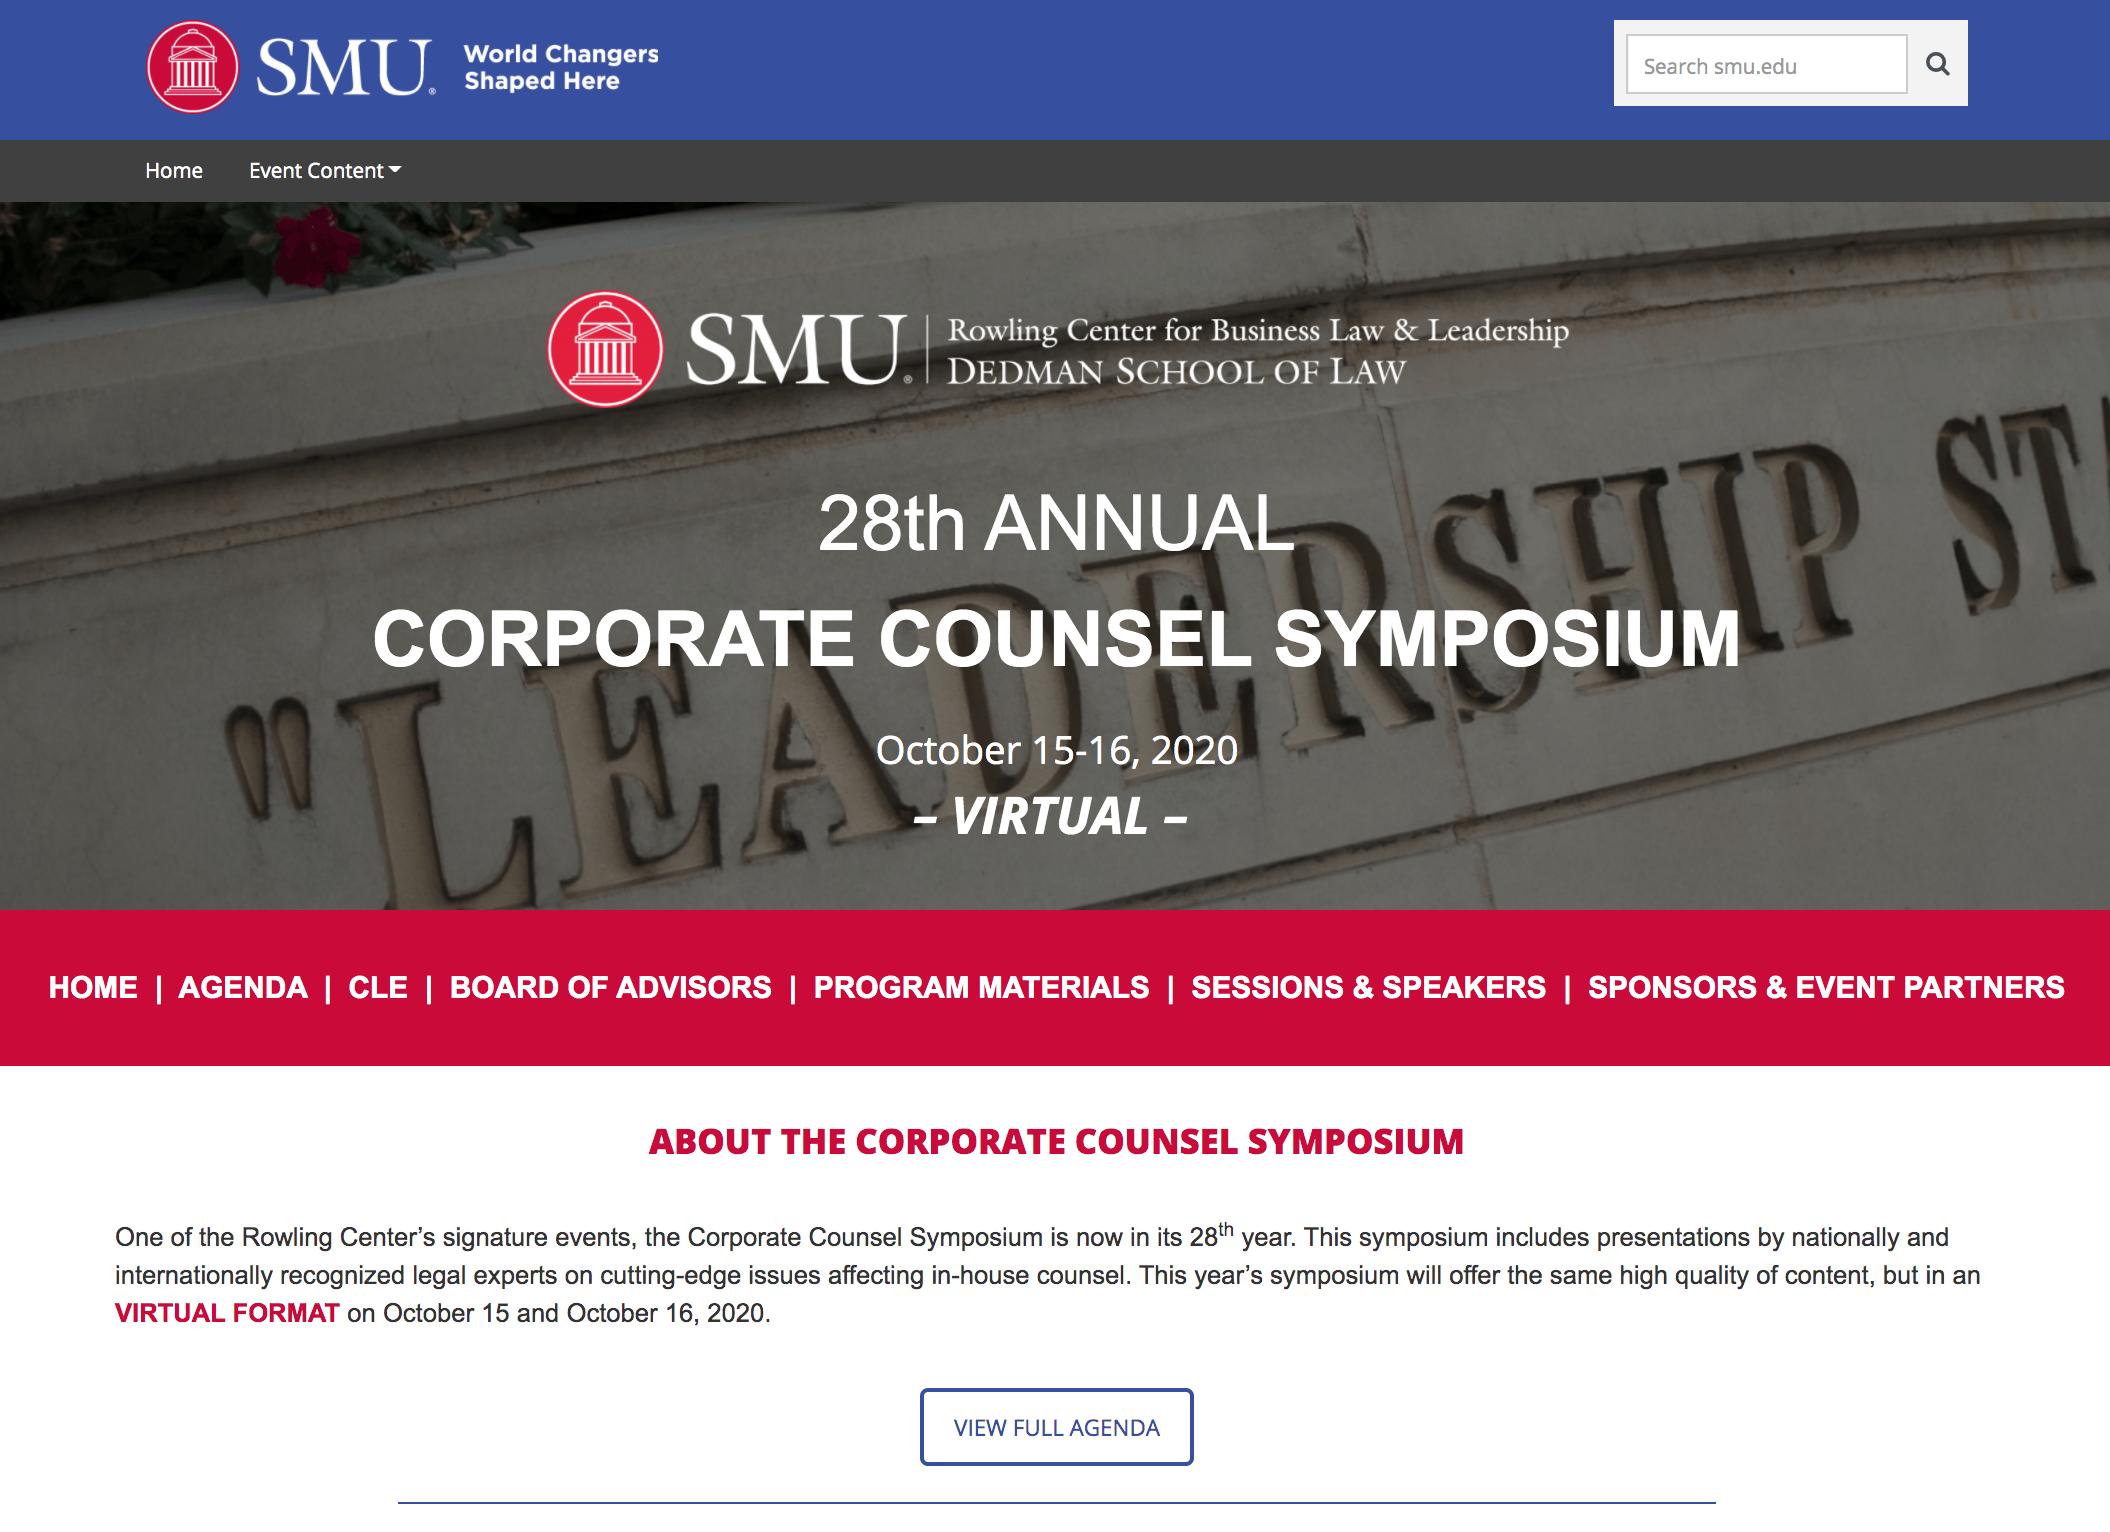 blog.smu.edu/rowling/2020-corporate-counsel-symposium/